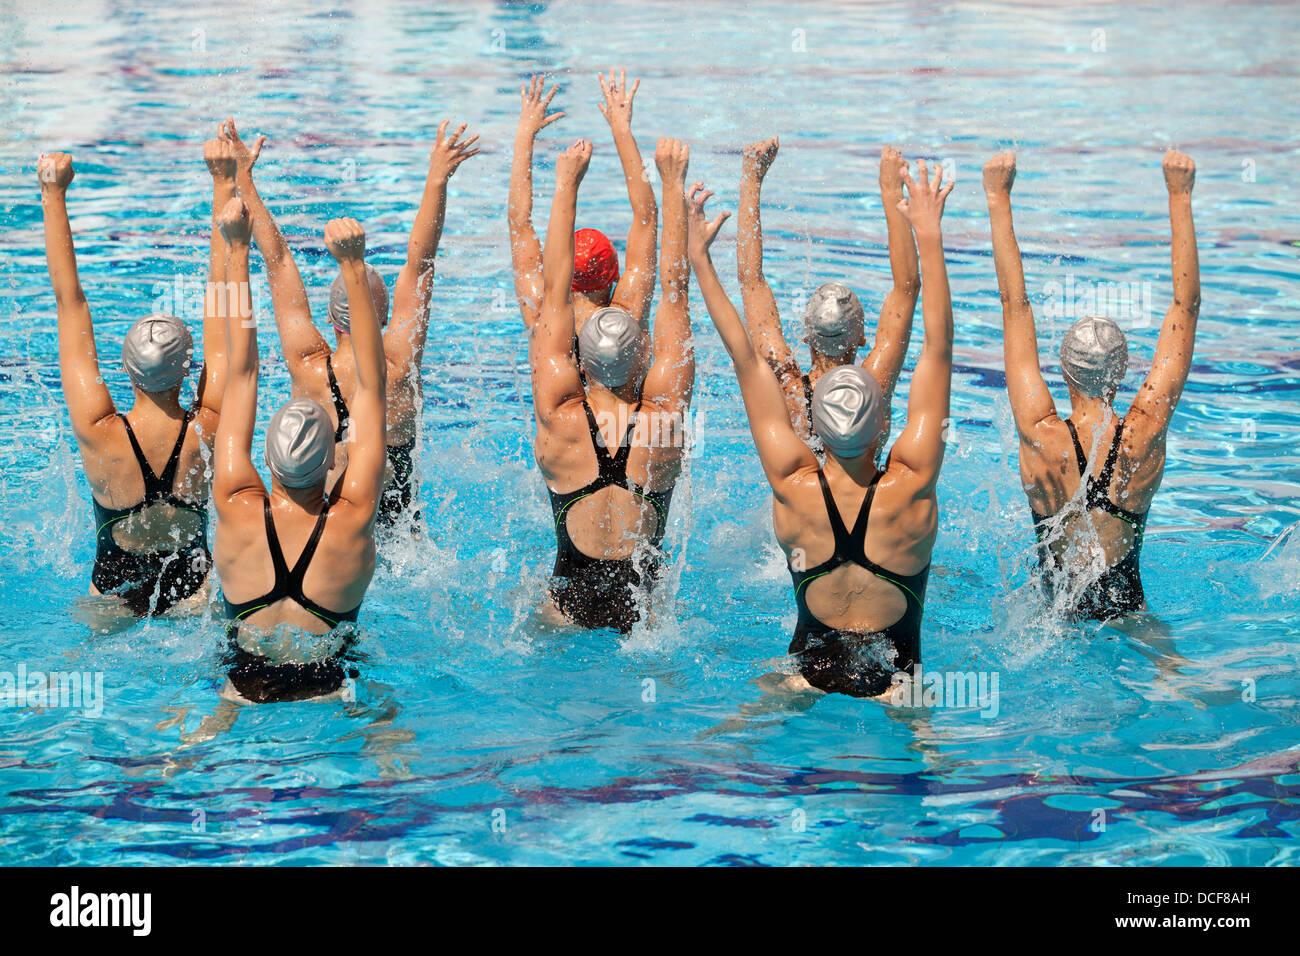 synchronized swimmers choreography - Stock Image